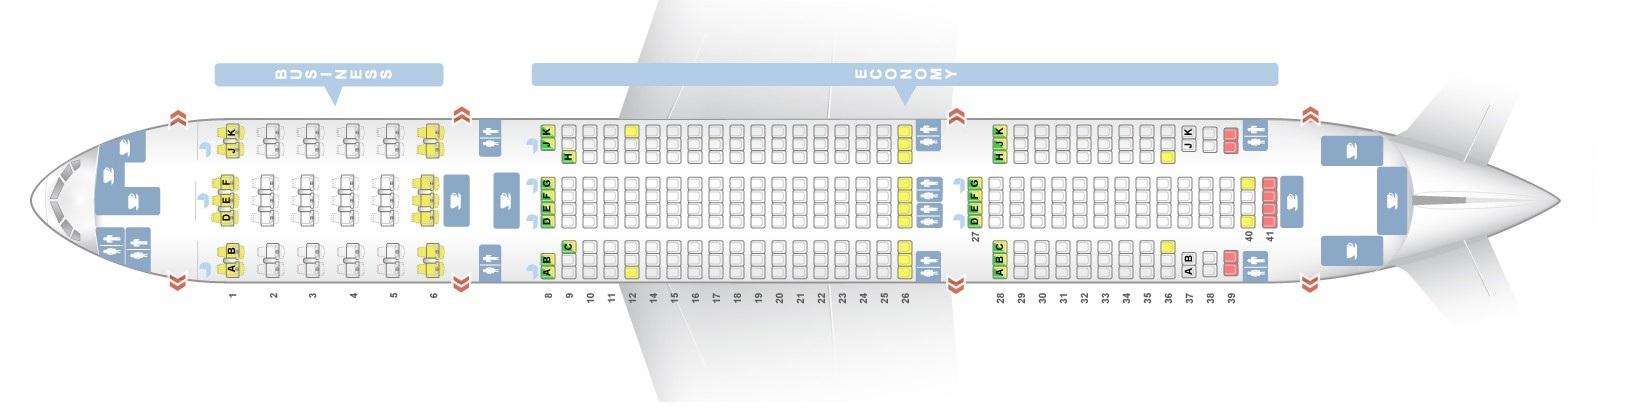 Emirates_Airlines_Boeing_777-200